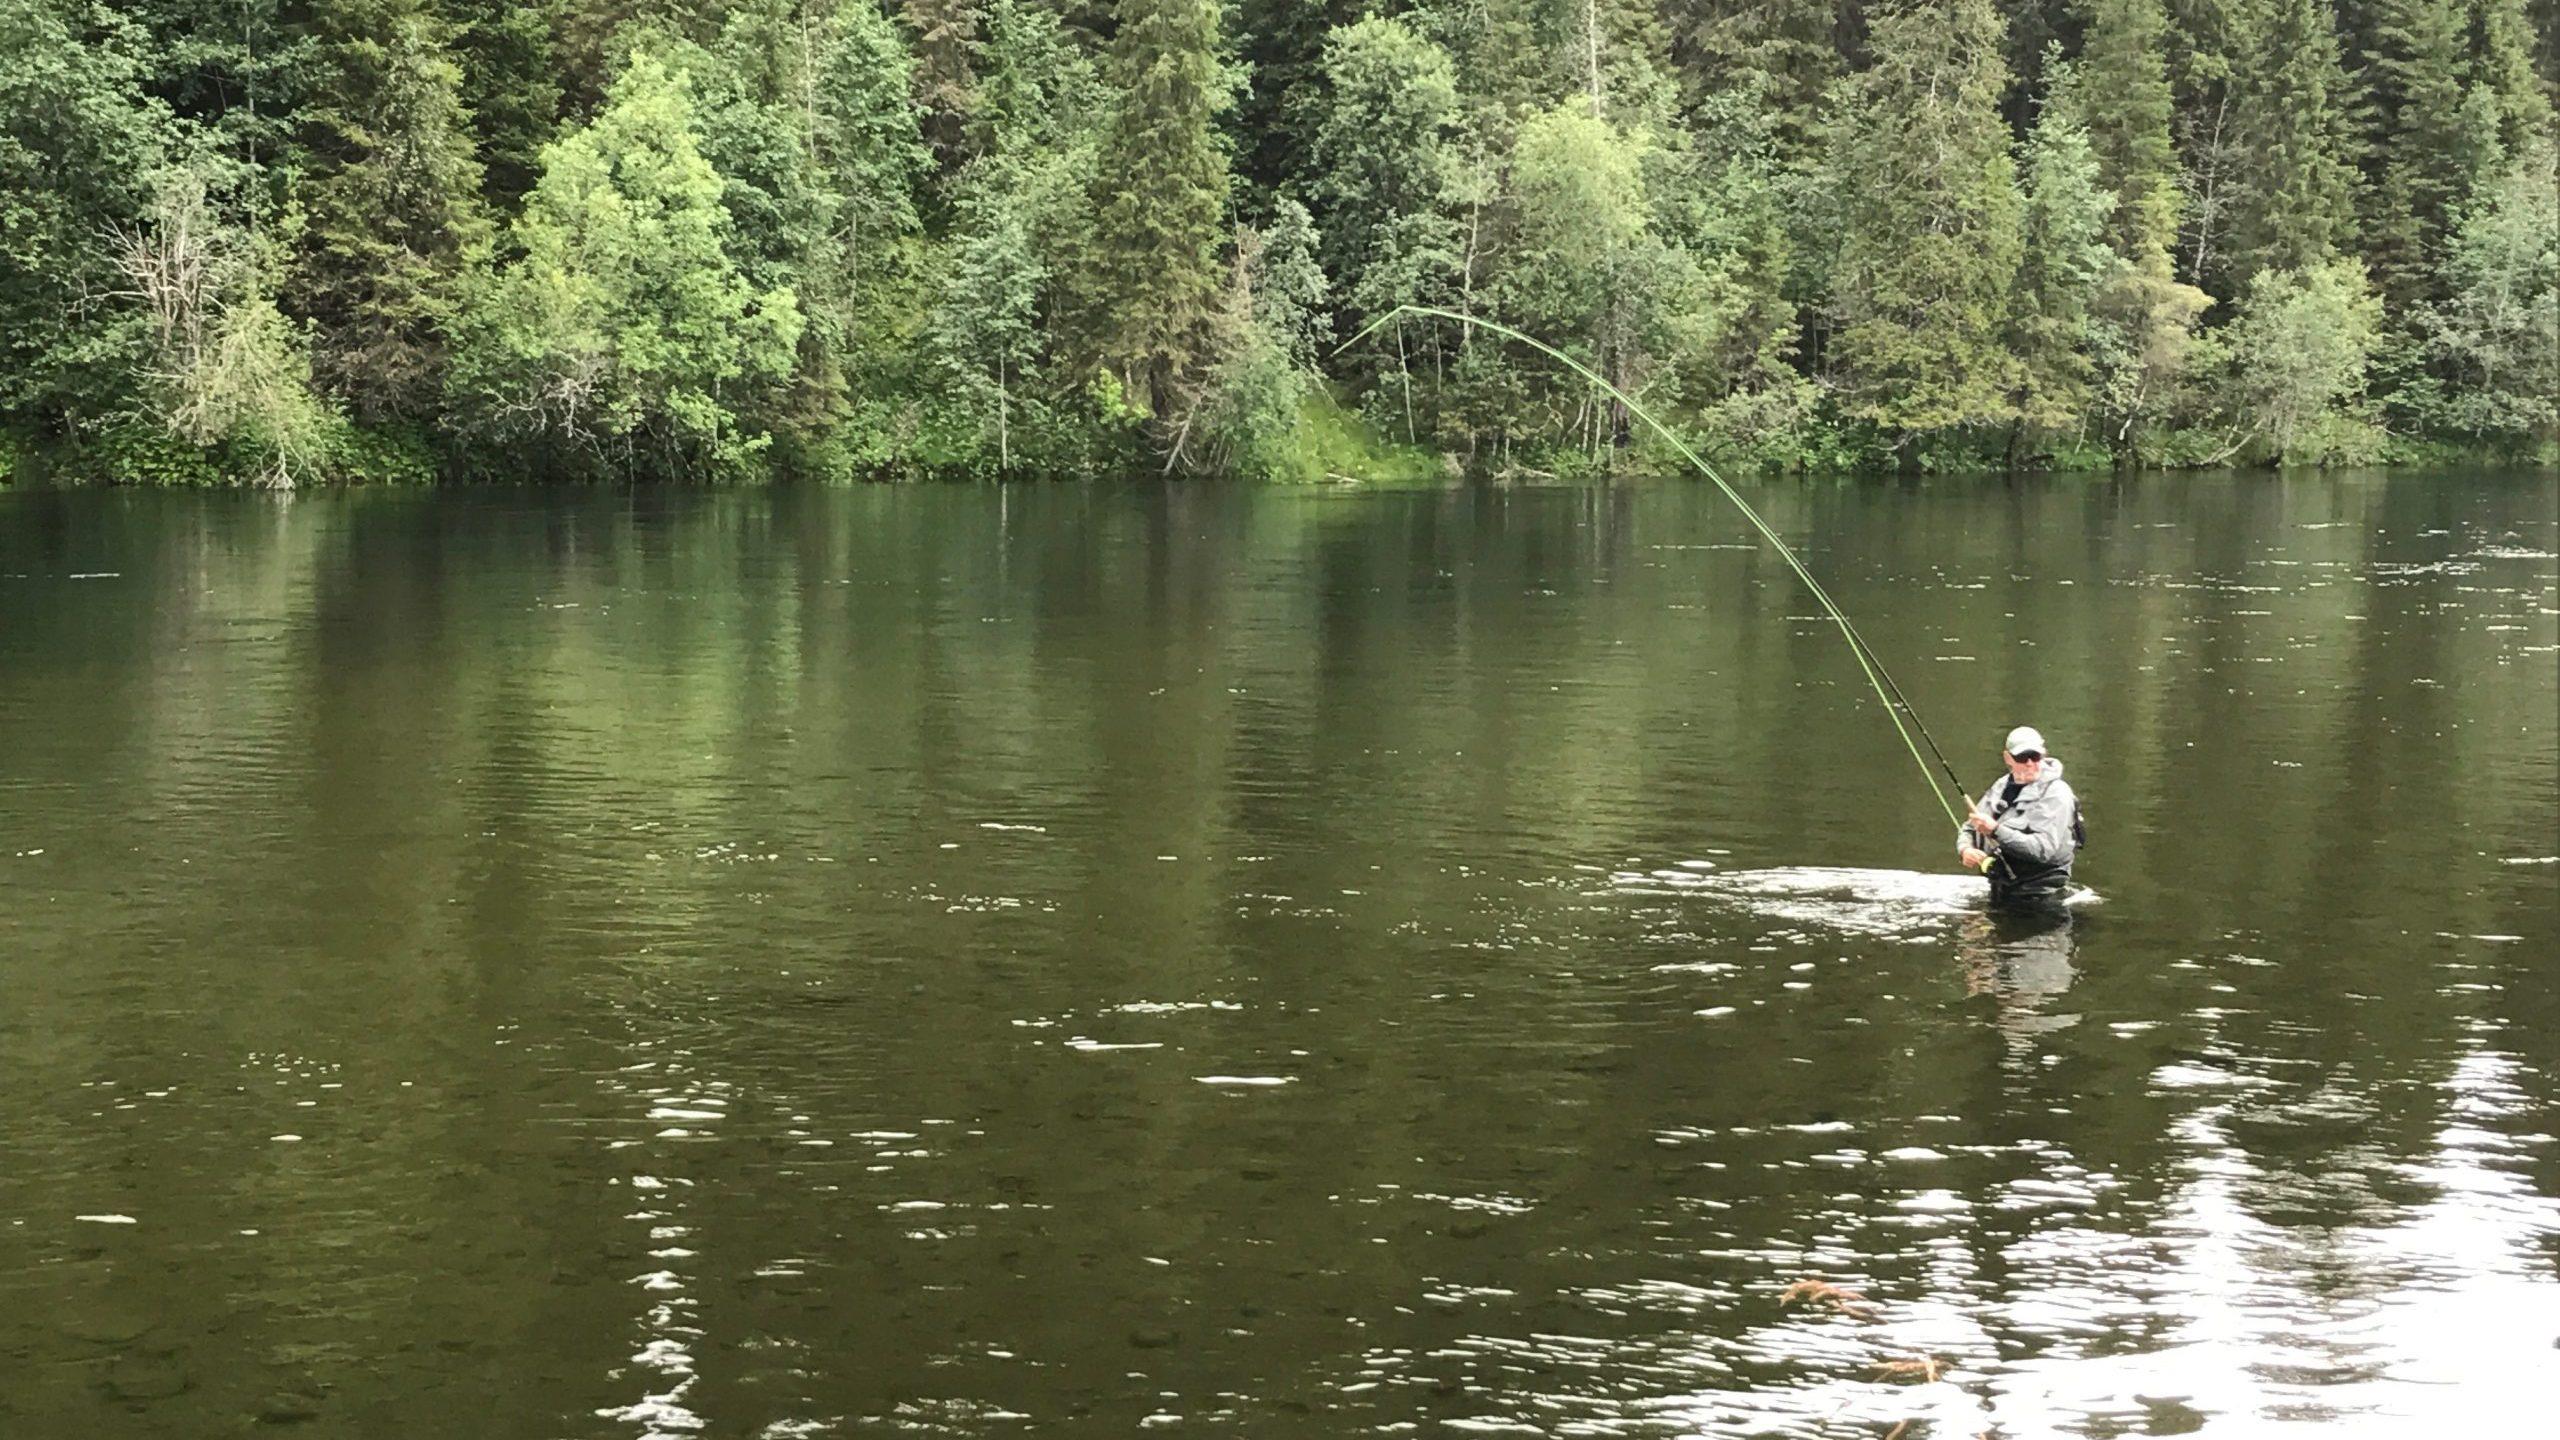 Laksefisker som står midt i elva med fisk på kroken